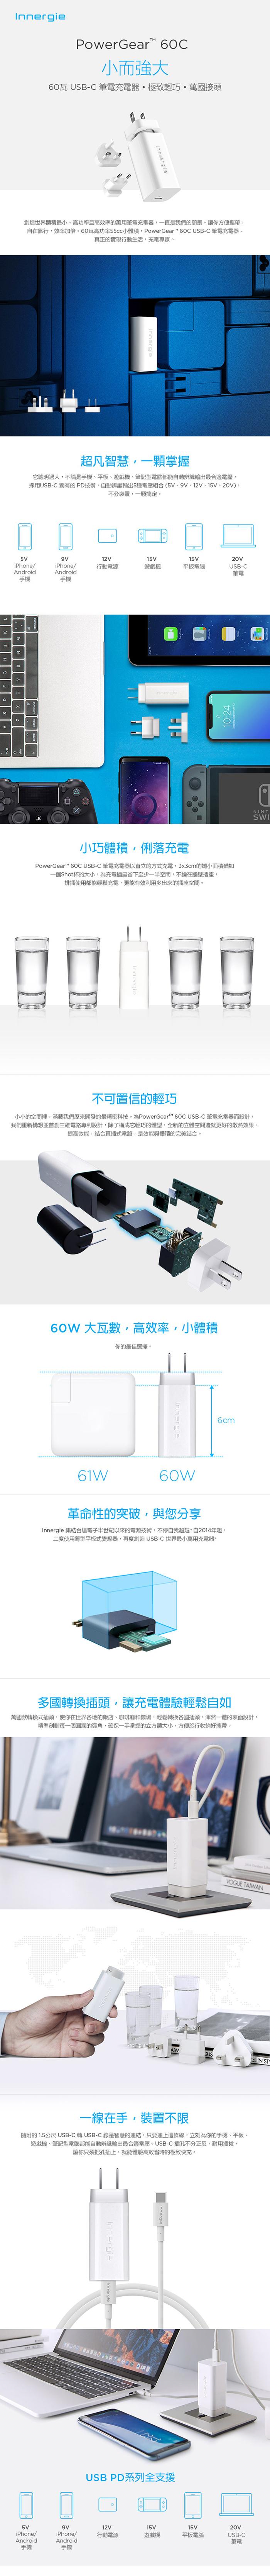 Innergie PowerGear™ 60C 60瓦 USB-C 筆電充電器(國際版)